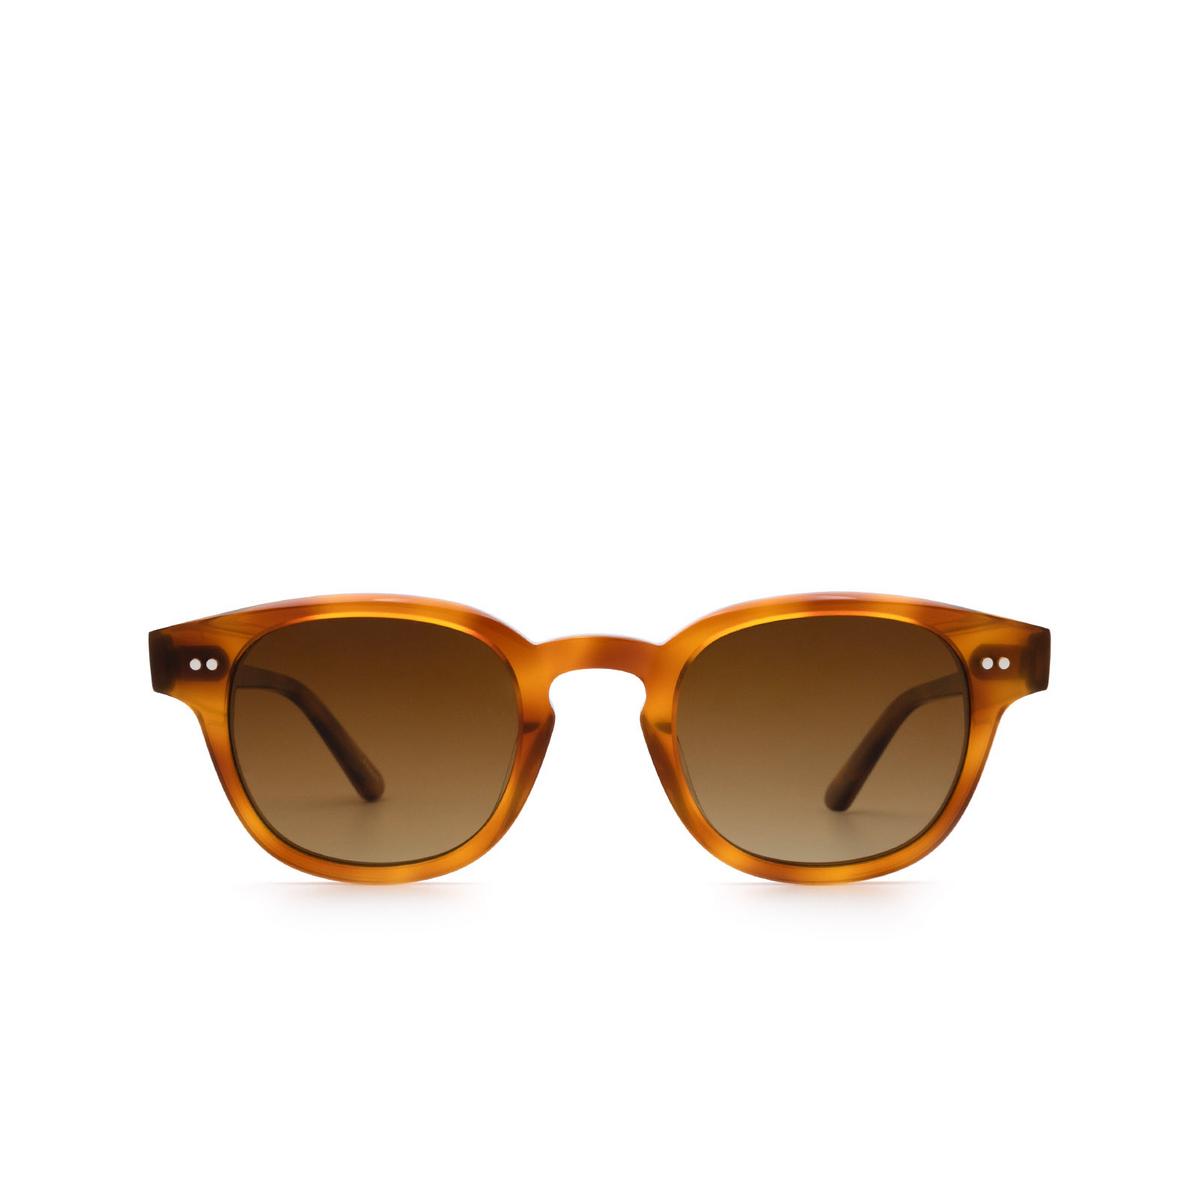 Chimi® Square Sunglasses: 01 color Havana - front view.